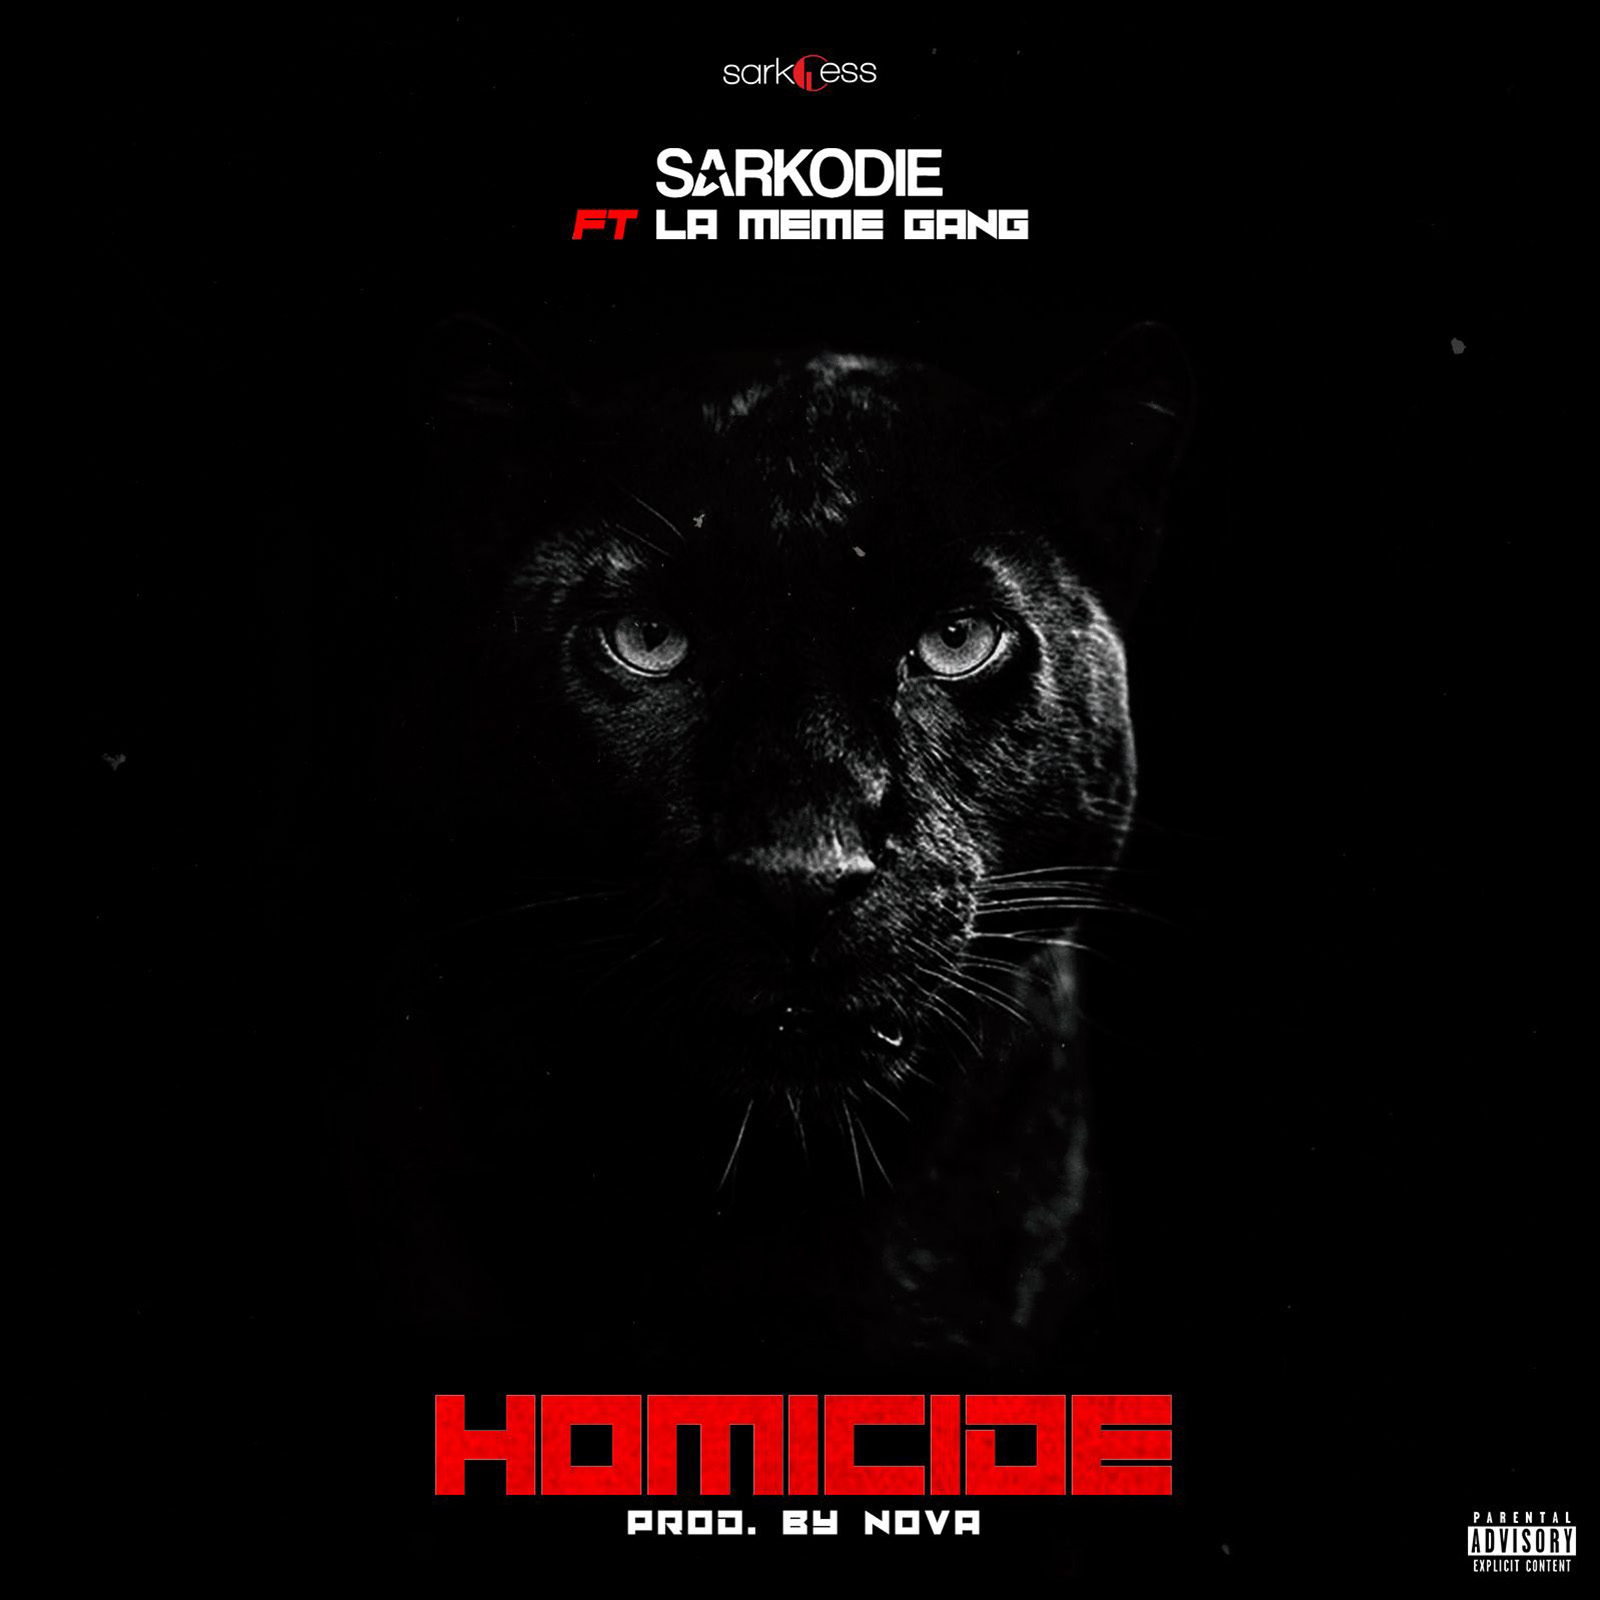 Homicide by Sarkodie feat. La Même Gang